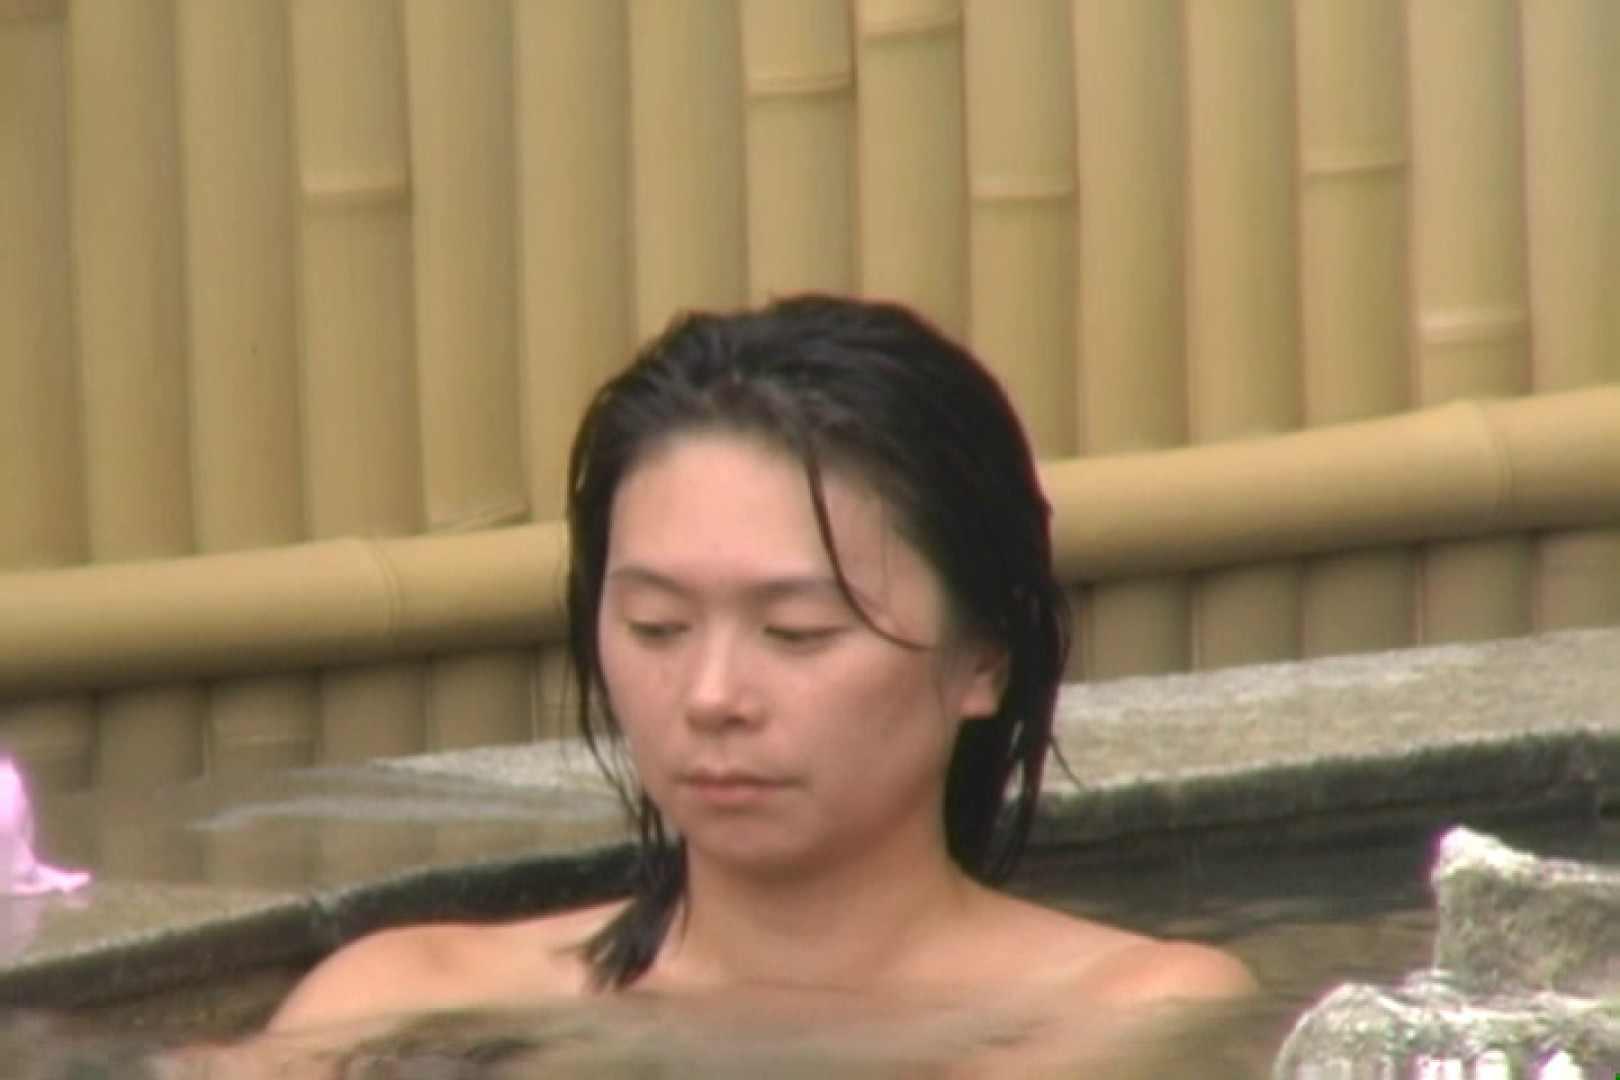 Aquaな露天風呂Vol.619 盗撮シリーズ | 露天風呂編  75PIX 3